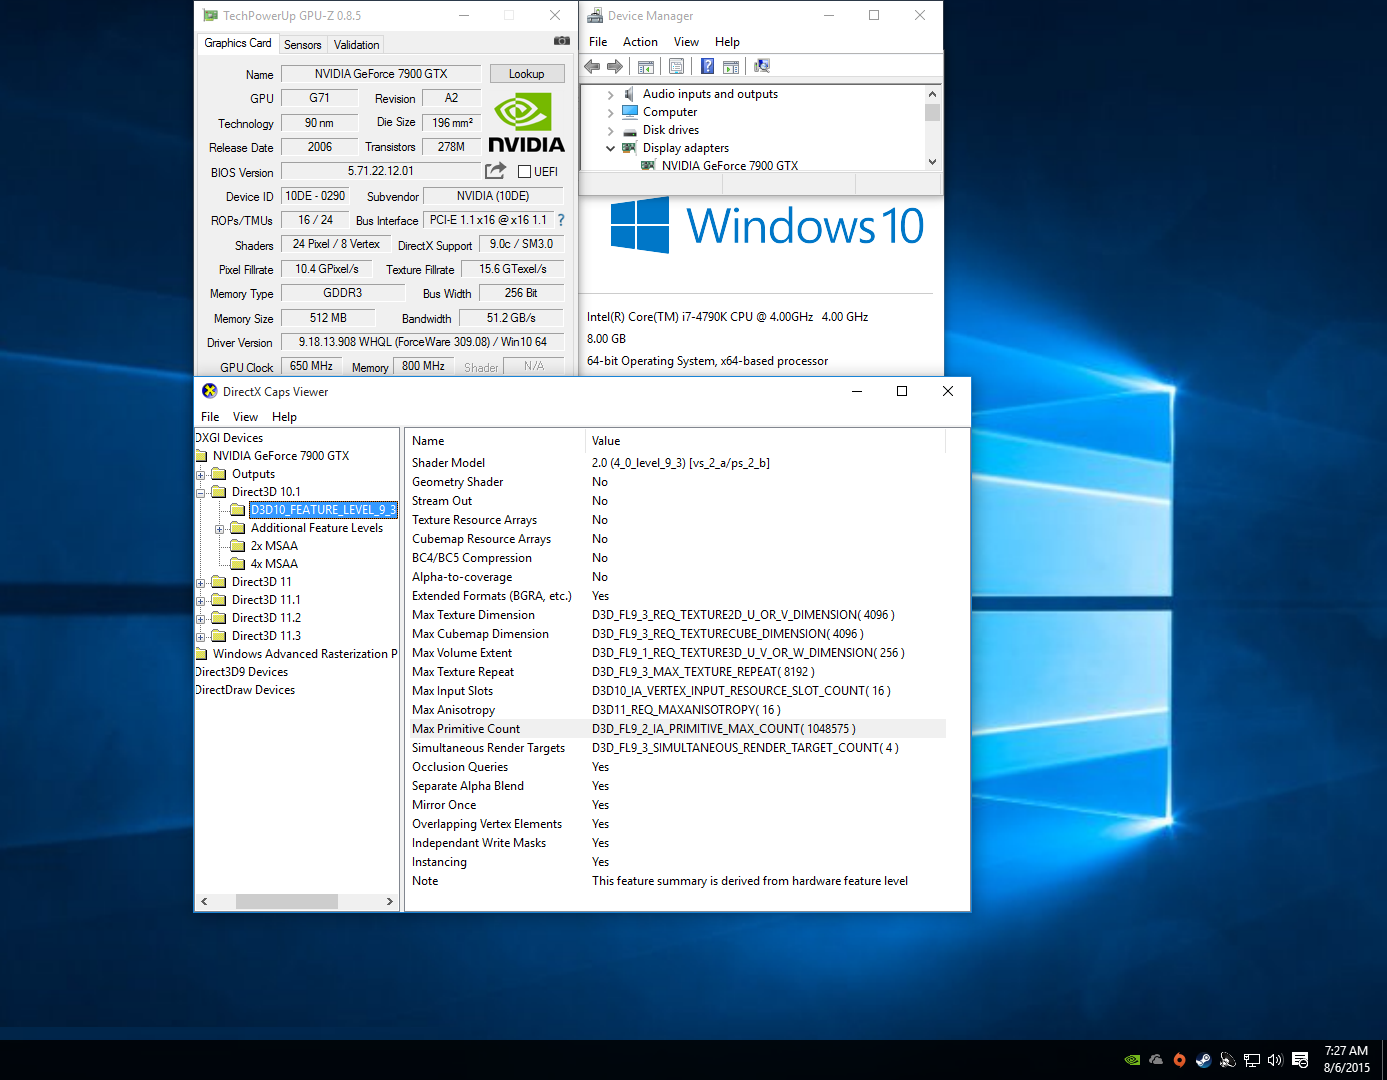 Download Free - Gtx 560 Ti Drivers Windows 10 - nitrobertyl